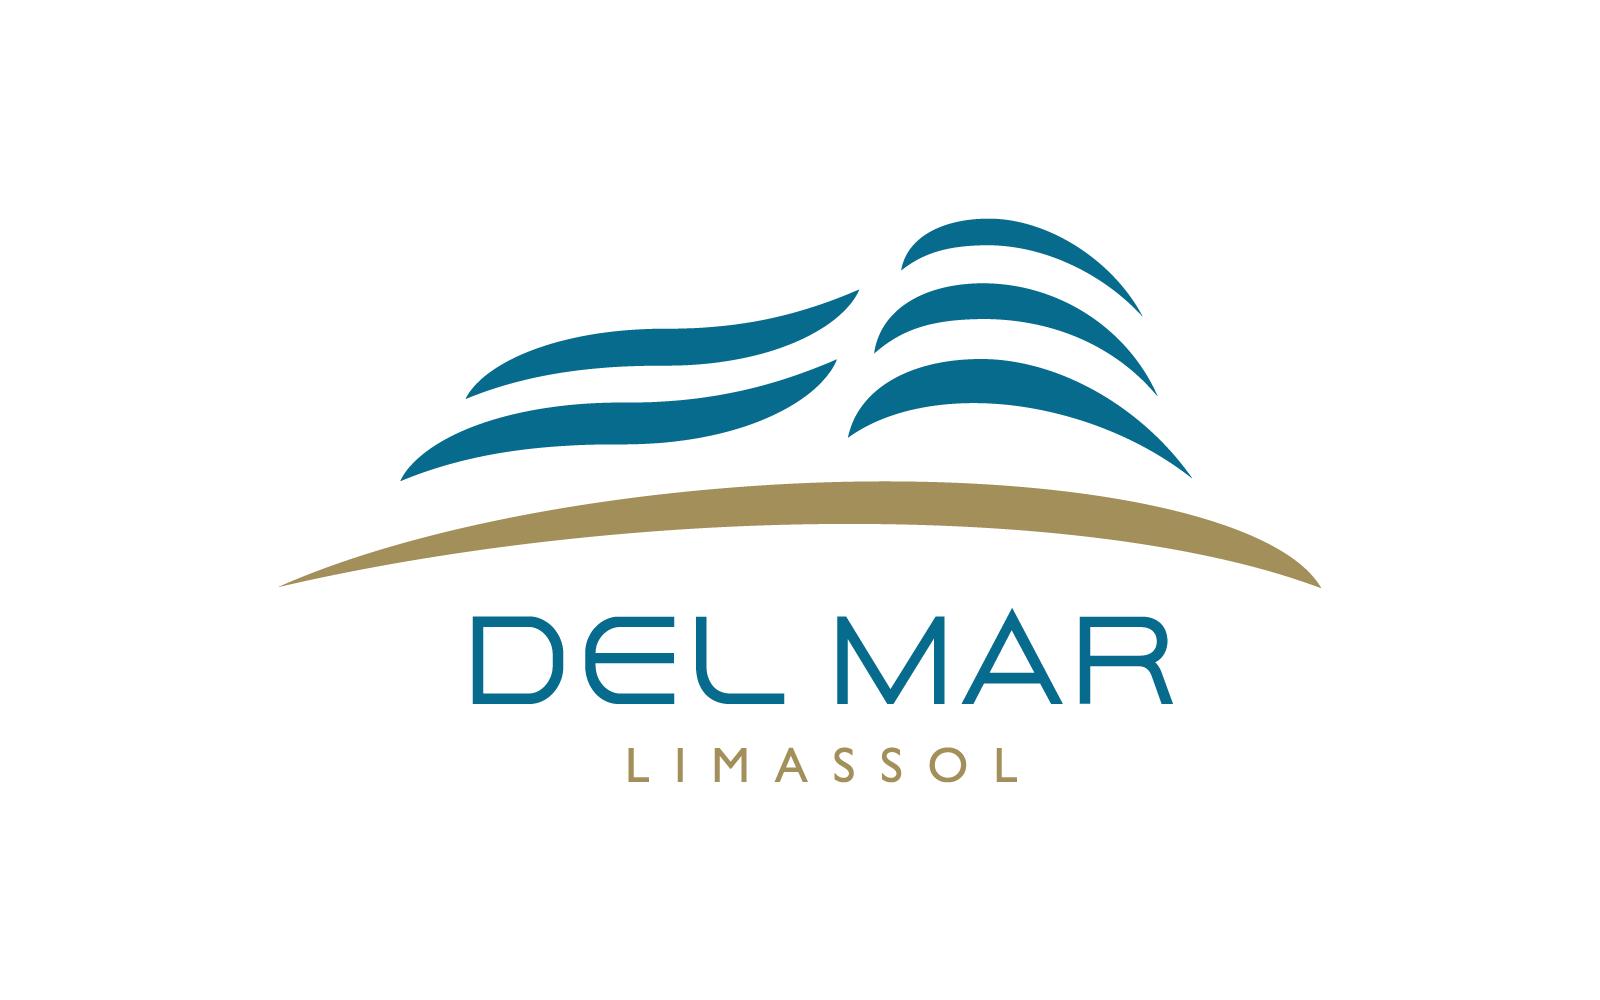 dm-logo_01a.png